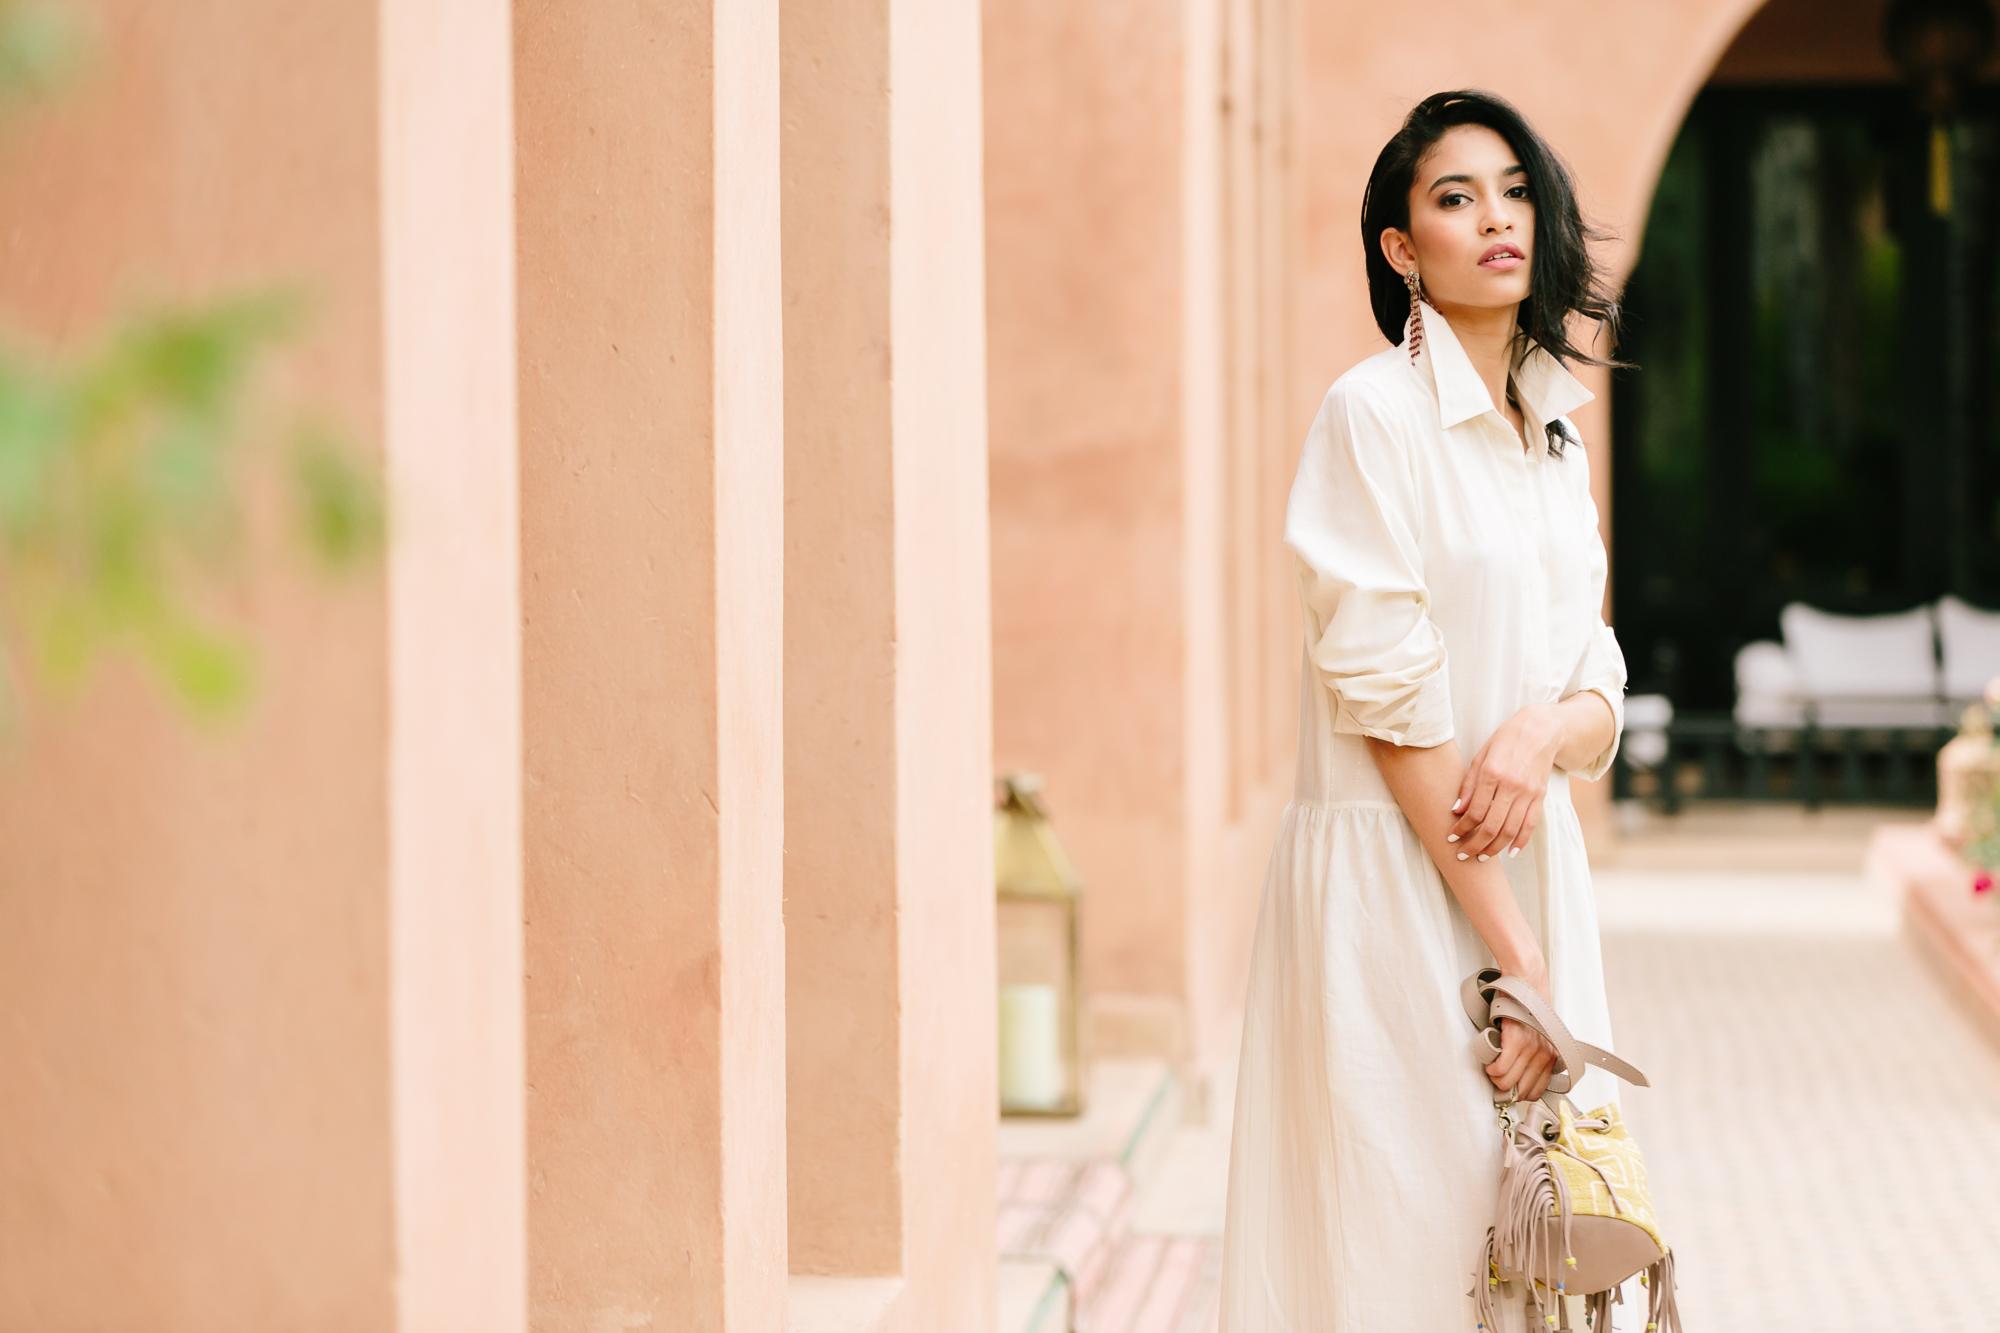 Moroccan designer lifestyle fashion